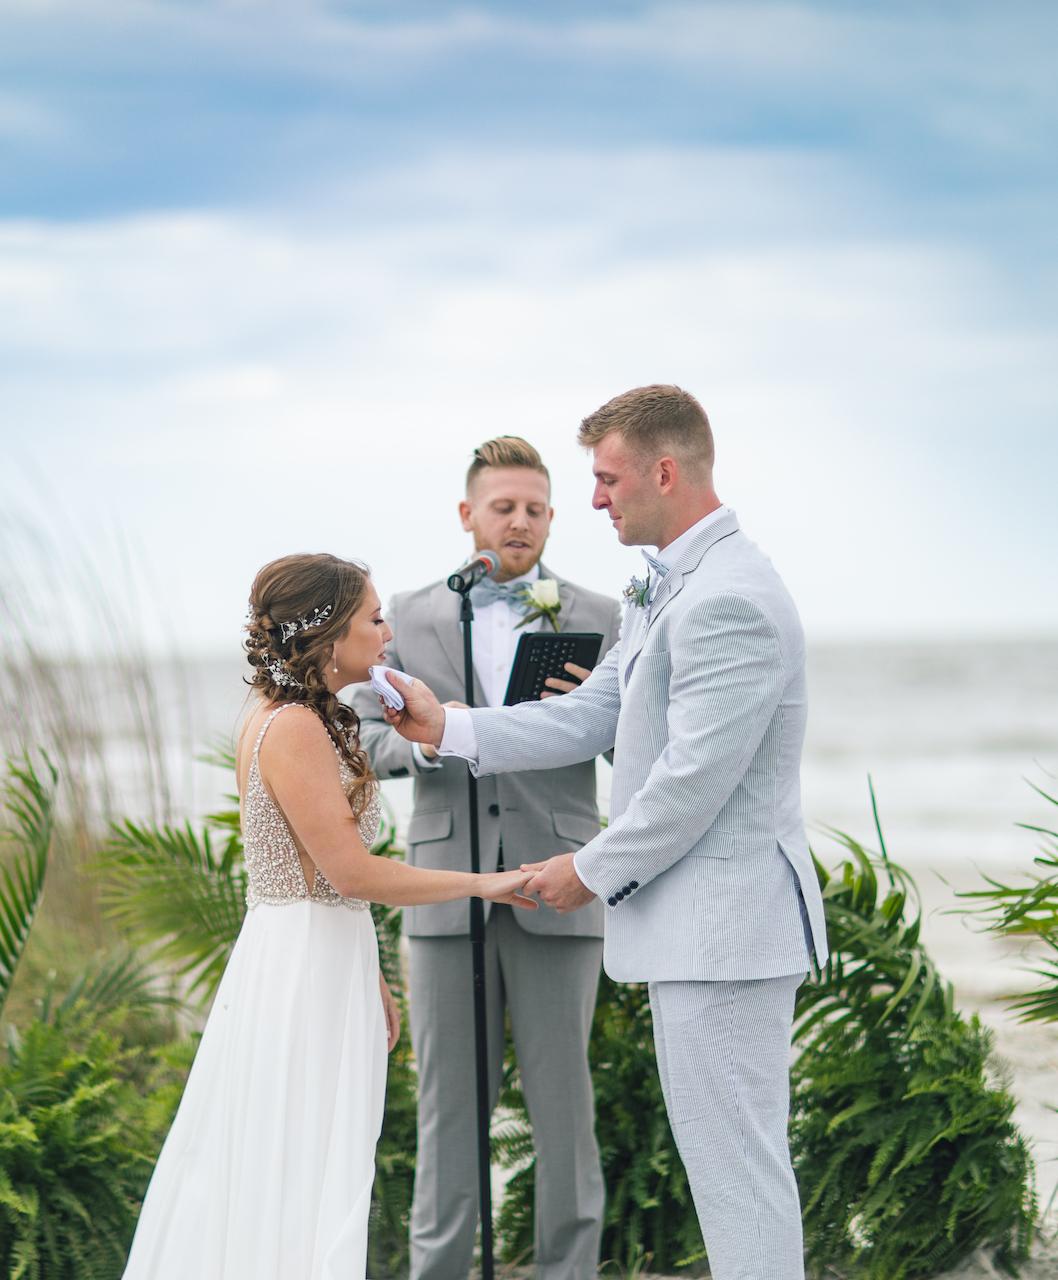 hilton-head-island-wedding-sc-ceremony100.jpg